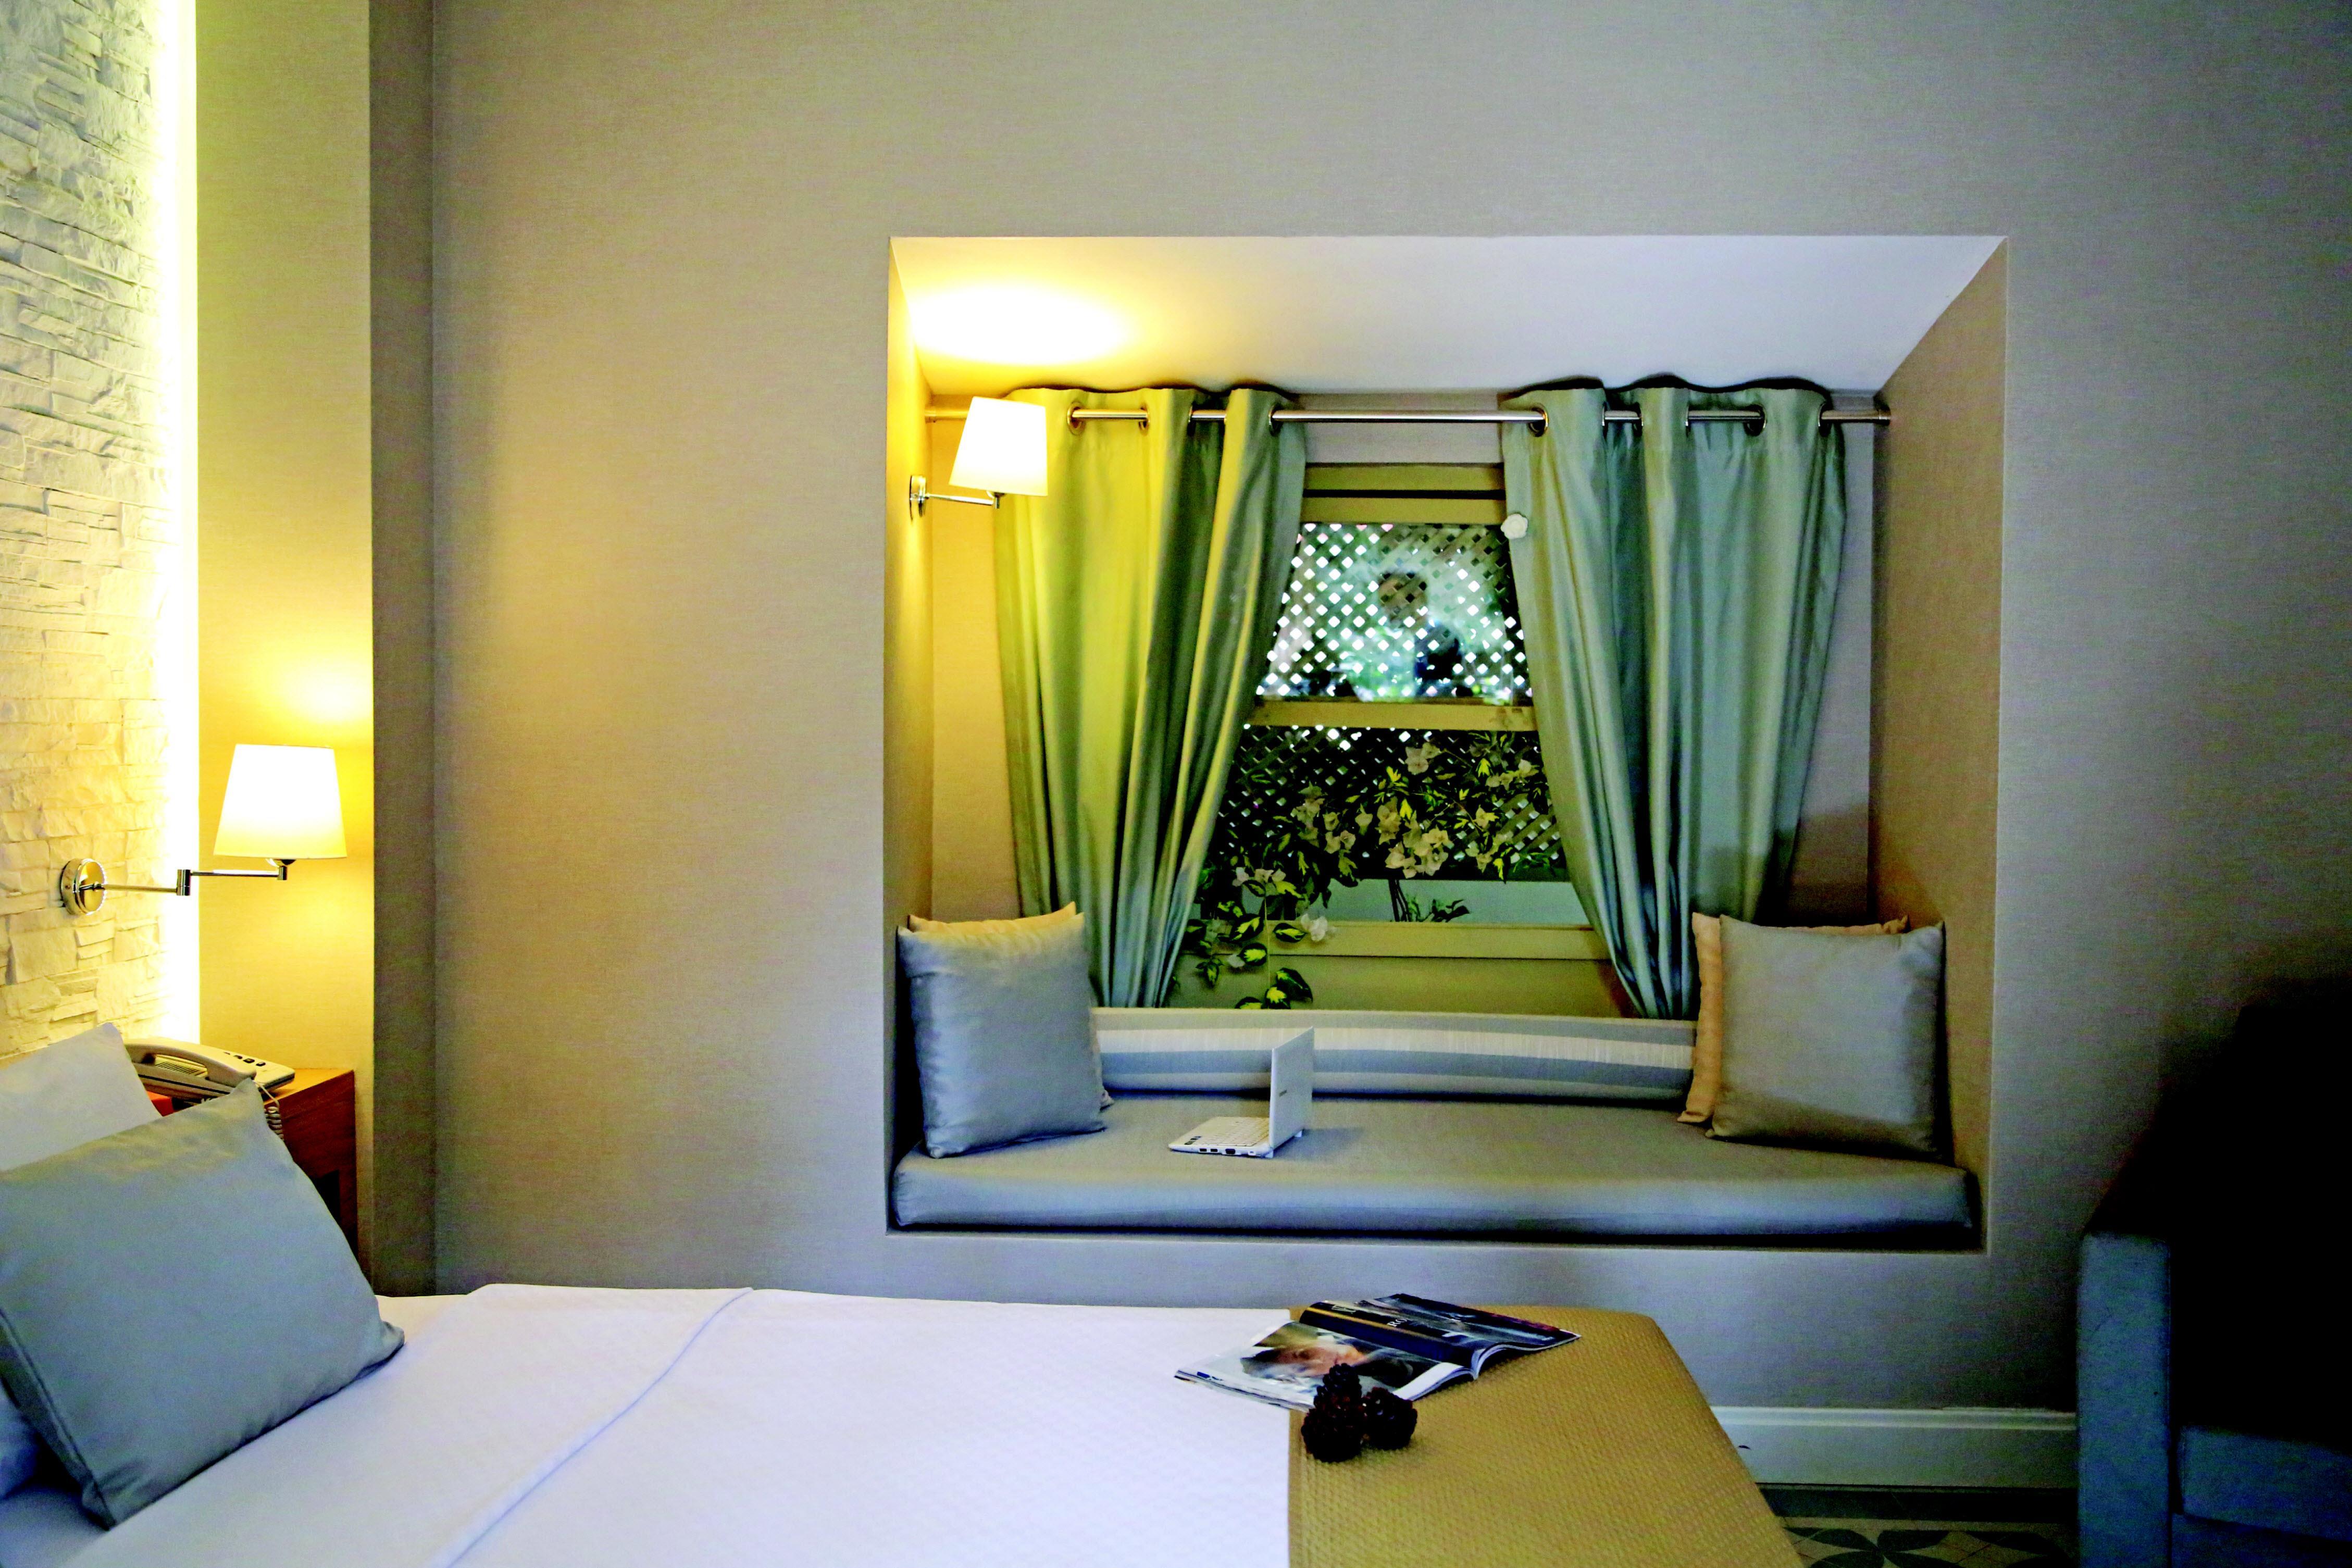 http://www.orextravel.sk/OREX/hotelphotos/ulusoy-kemer-holiday-club-area-0035.jpg